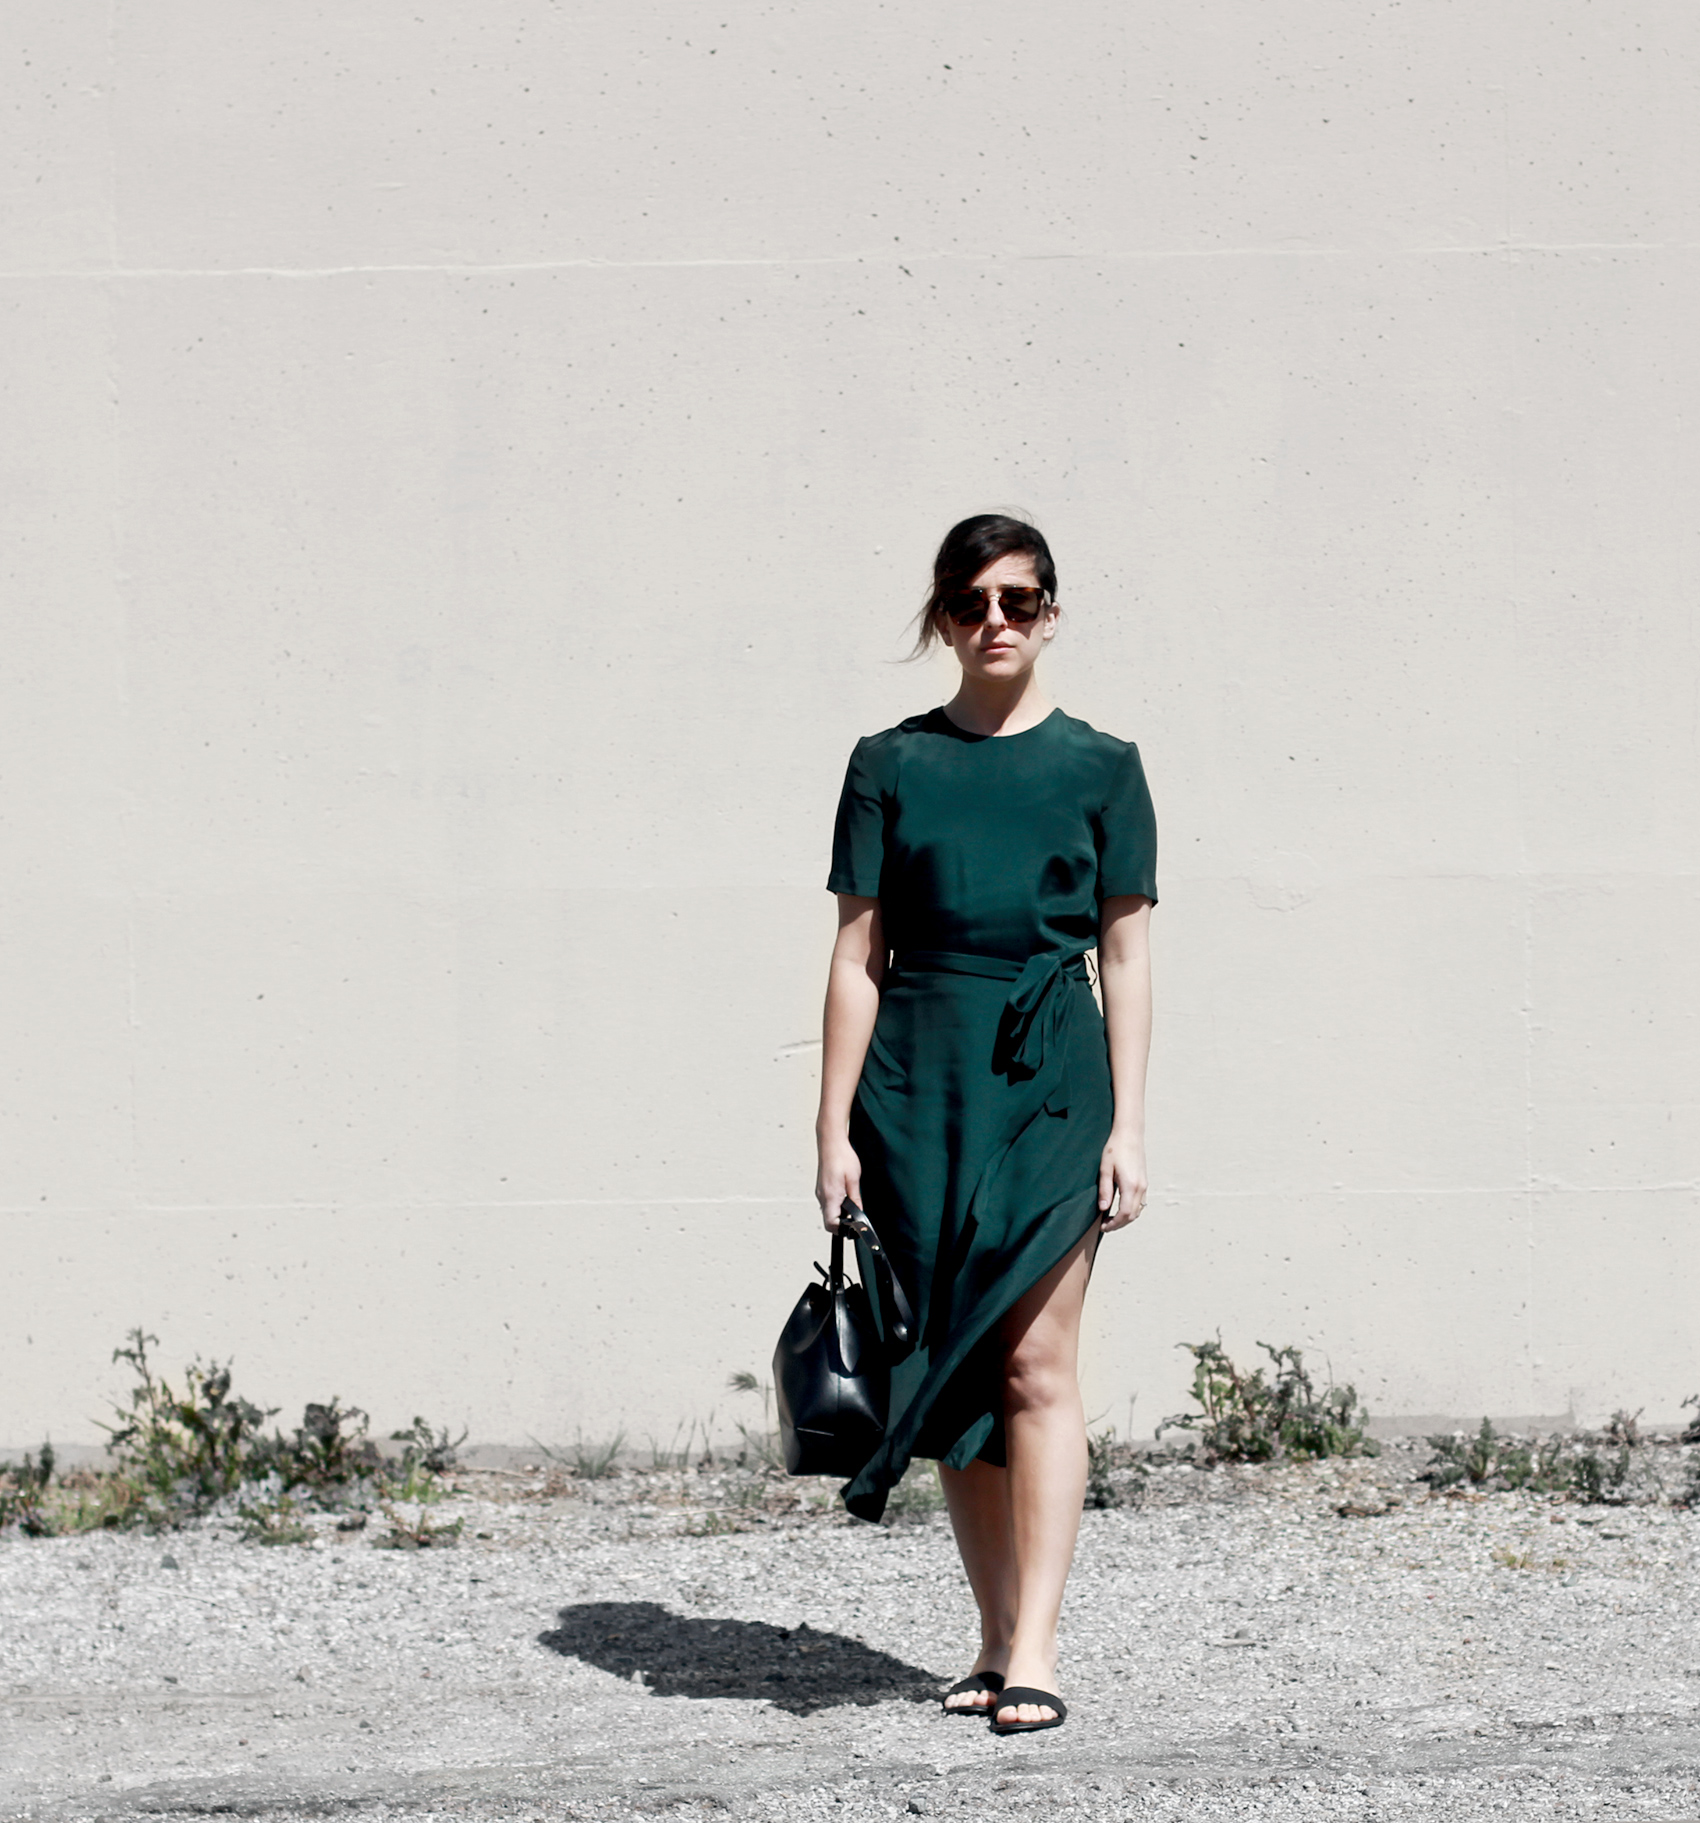 912-twelvoefour-1700-bucket-bag-summer-dress-IMG_7161.jpg